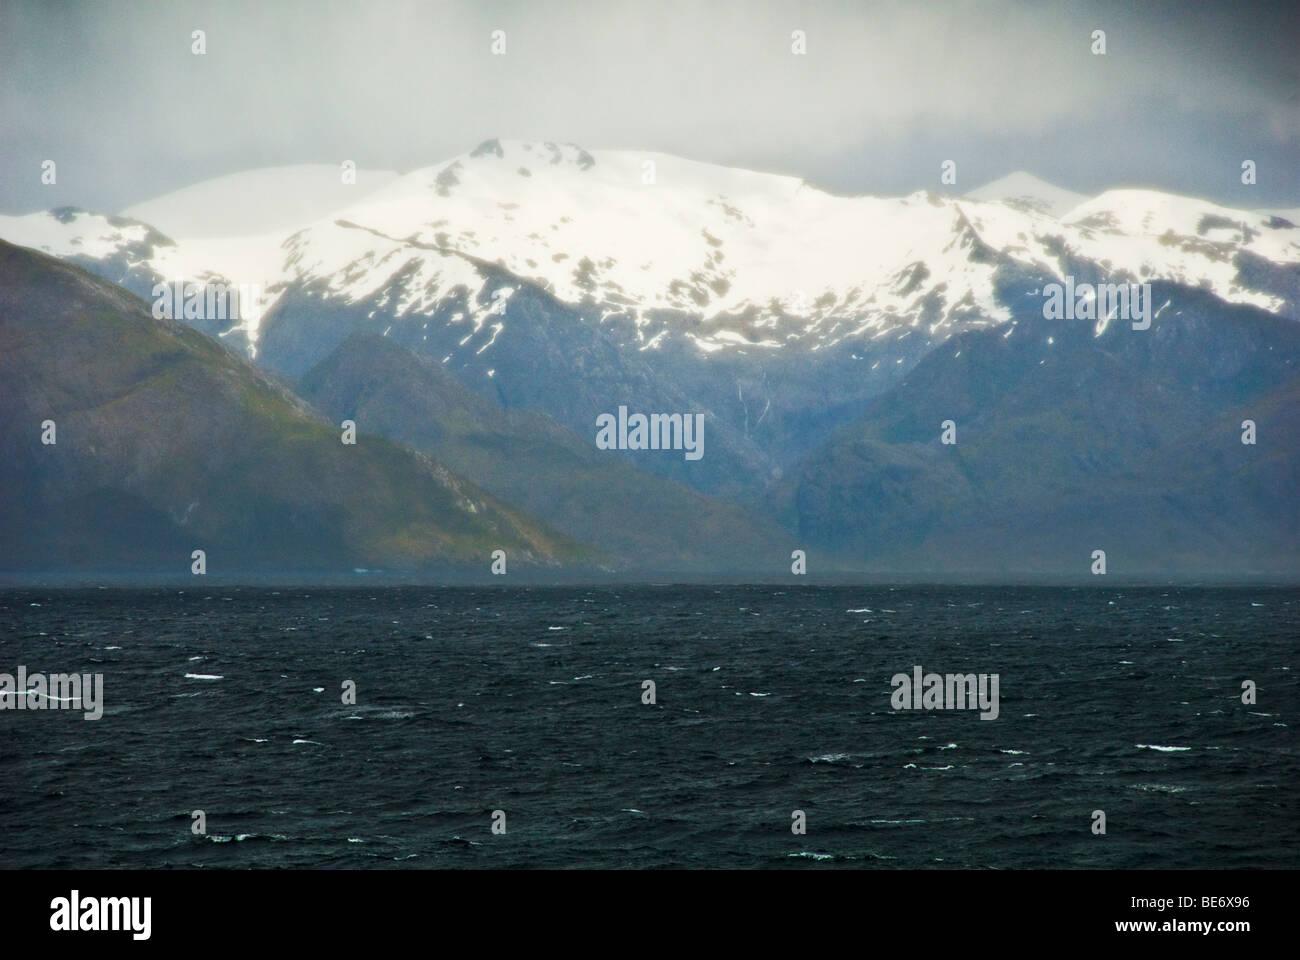 Scenic view of Strait of Magellan near Punta Arenas, Chile - Stock Image